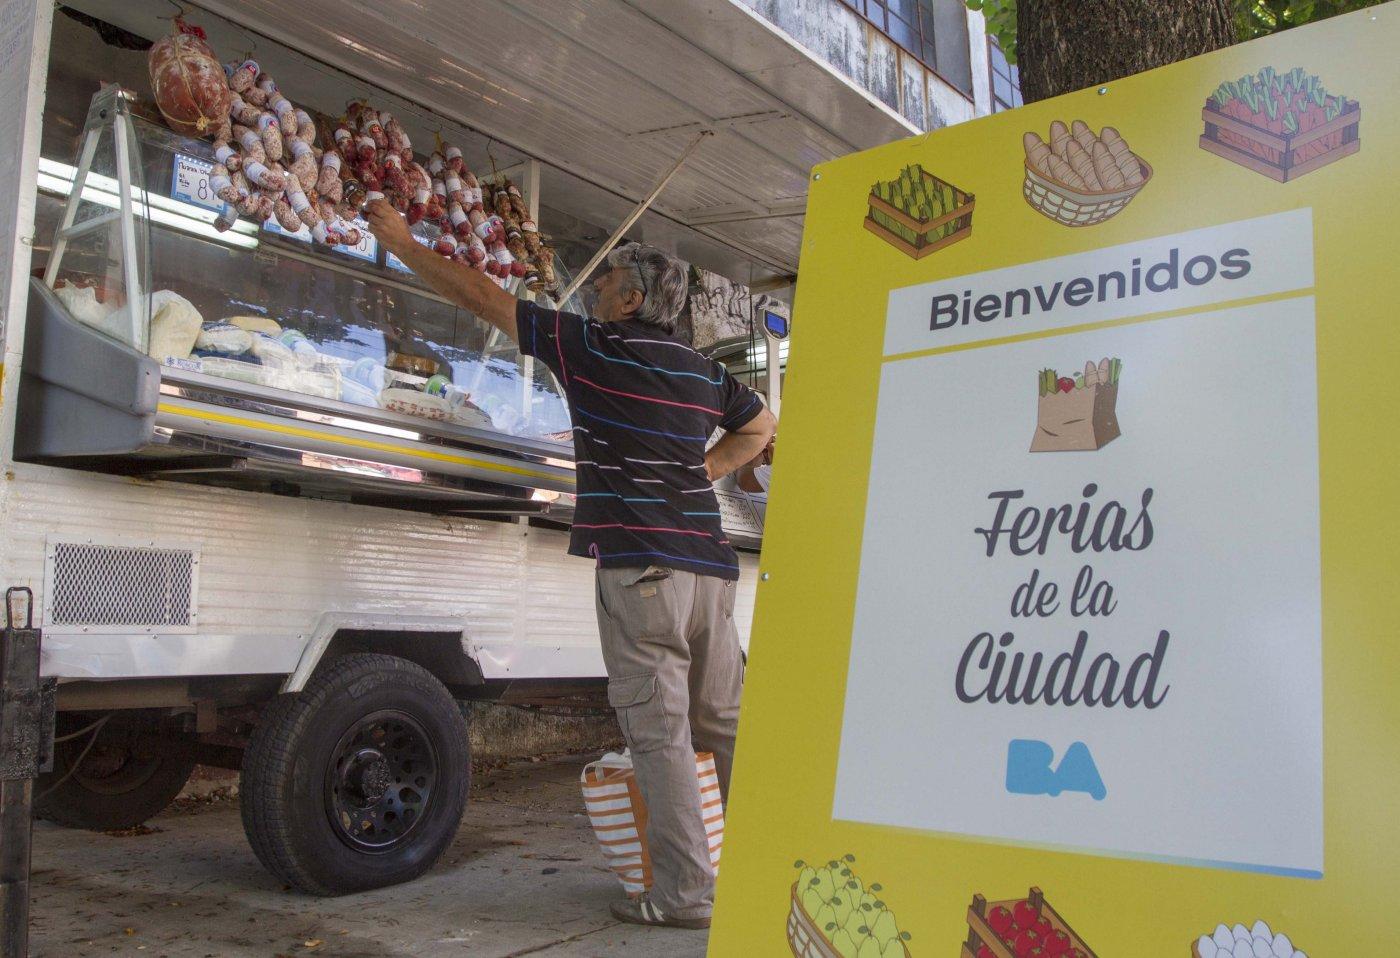 170224Fiab21 Ferias_MG_5235